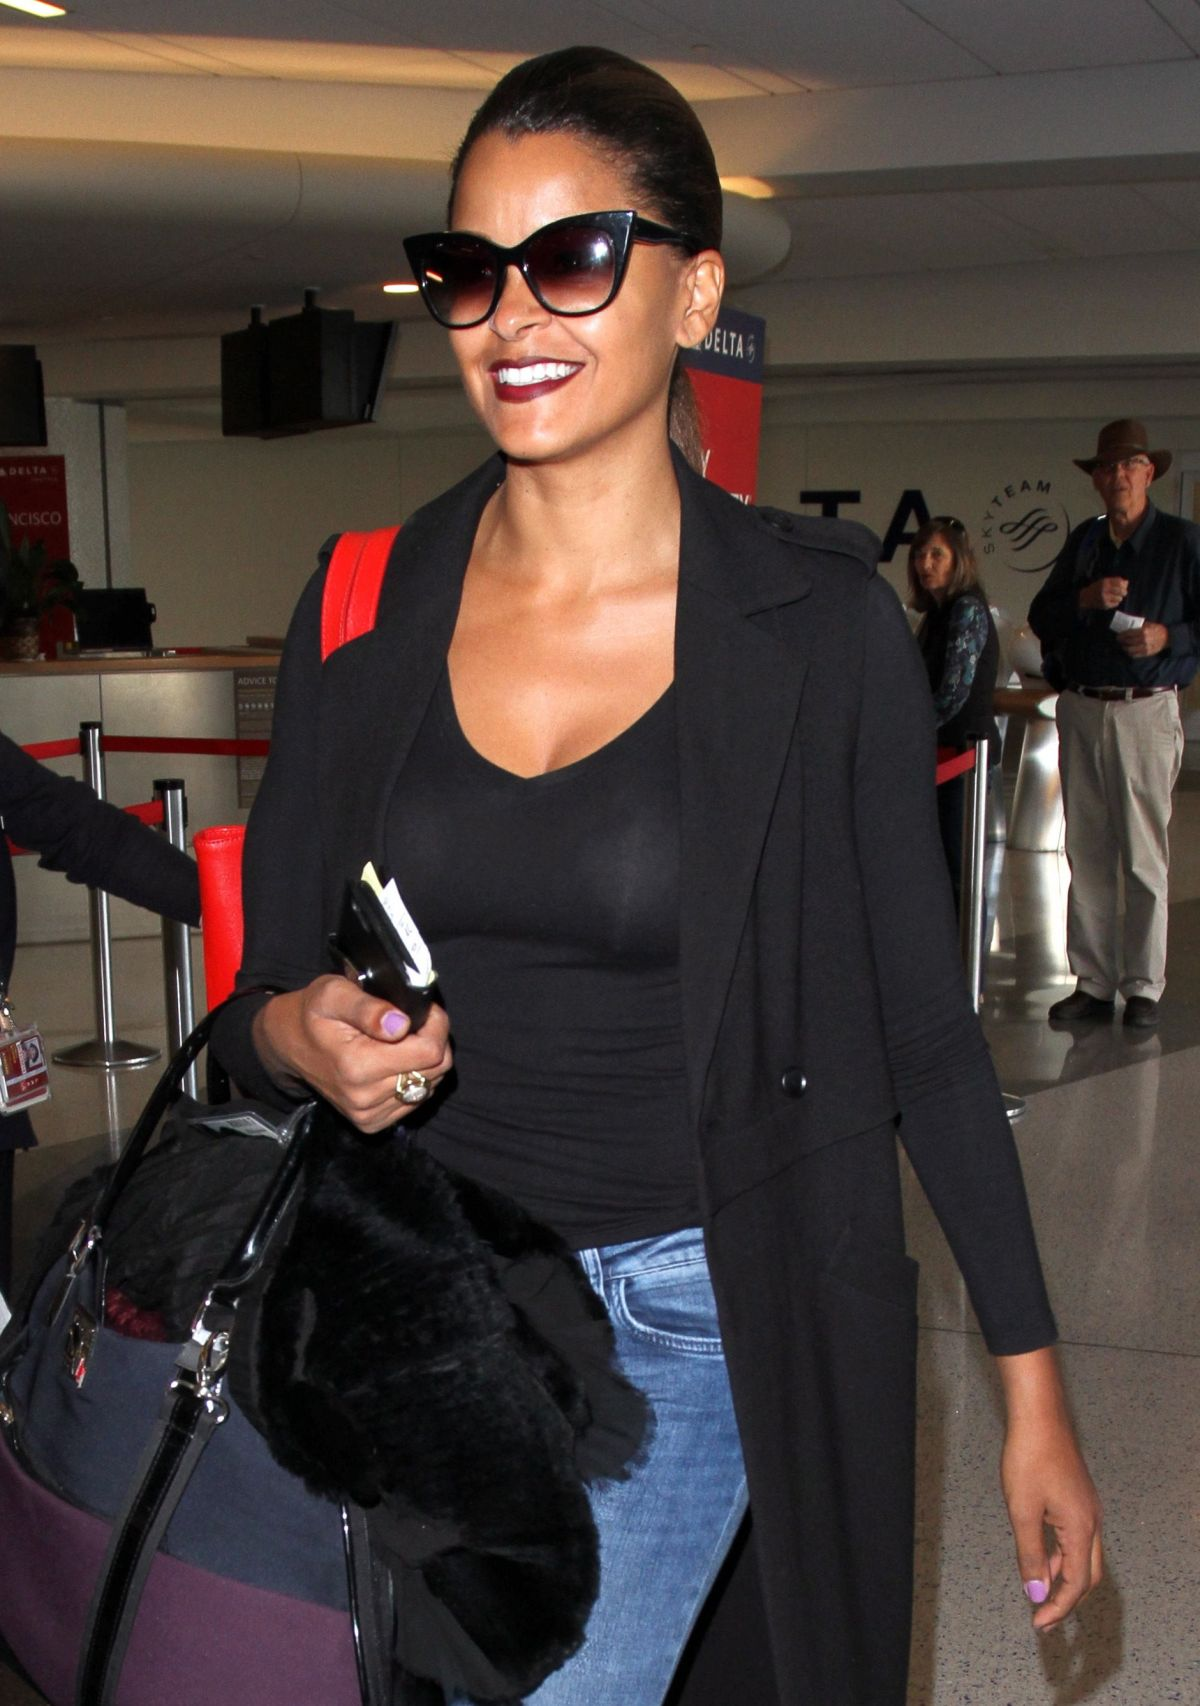 CLAUDIA JORDAN at LAX Airport in Los Angeles 02/09/2016